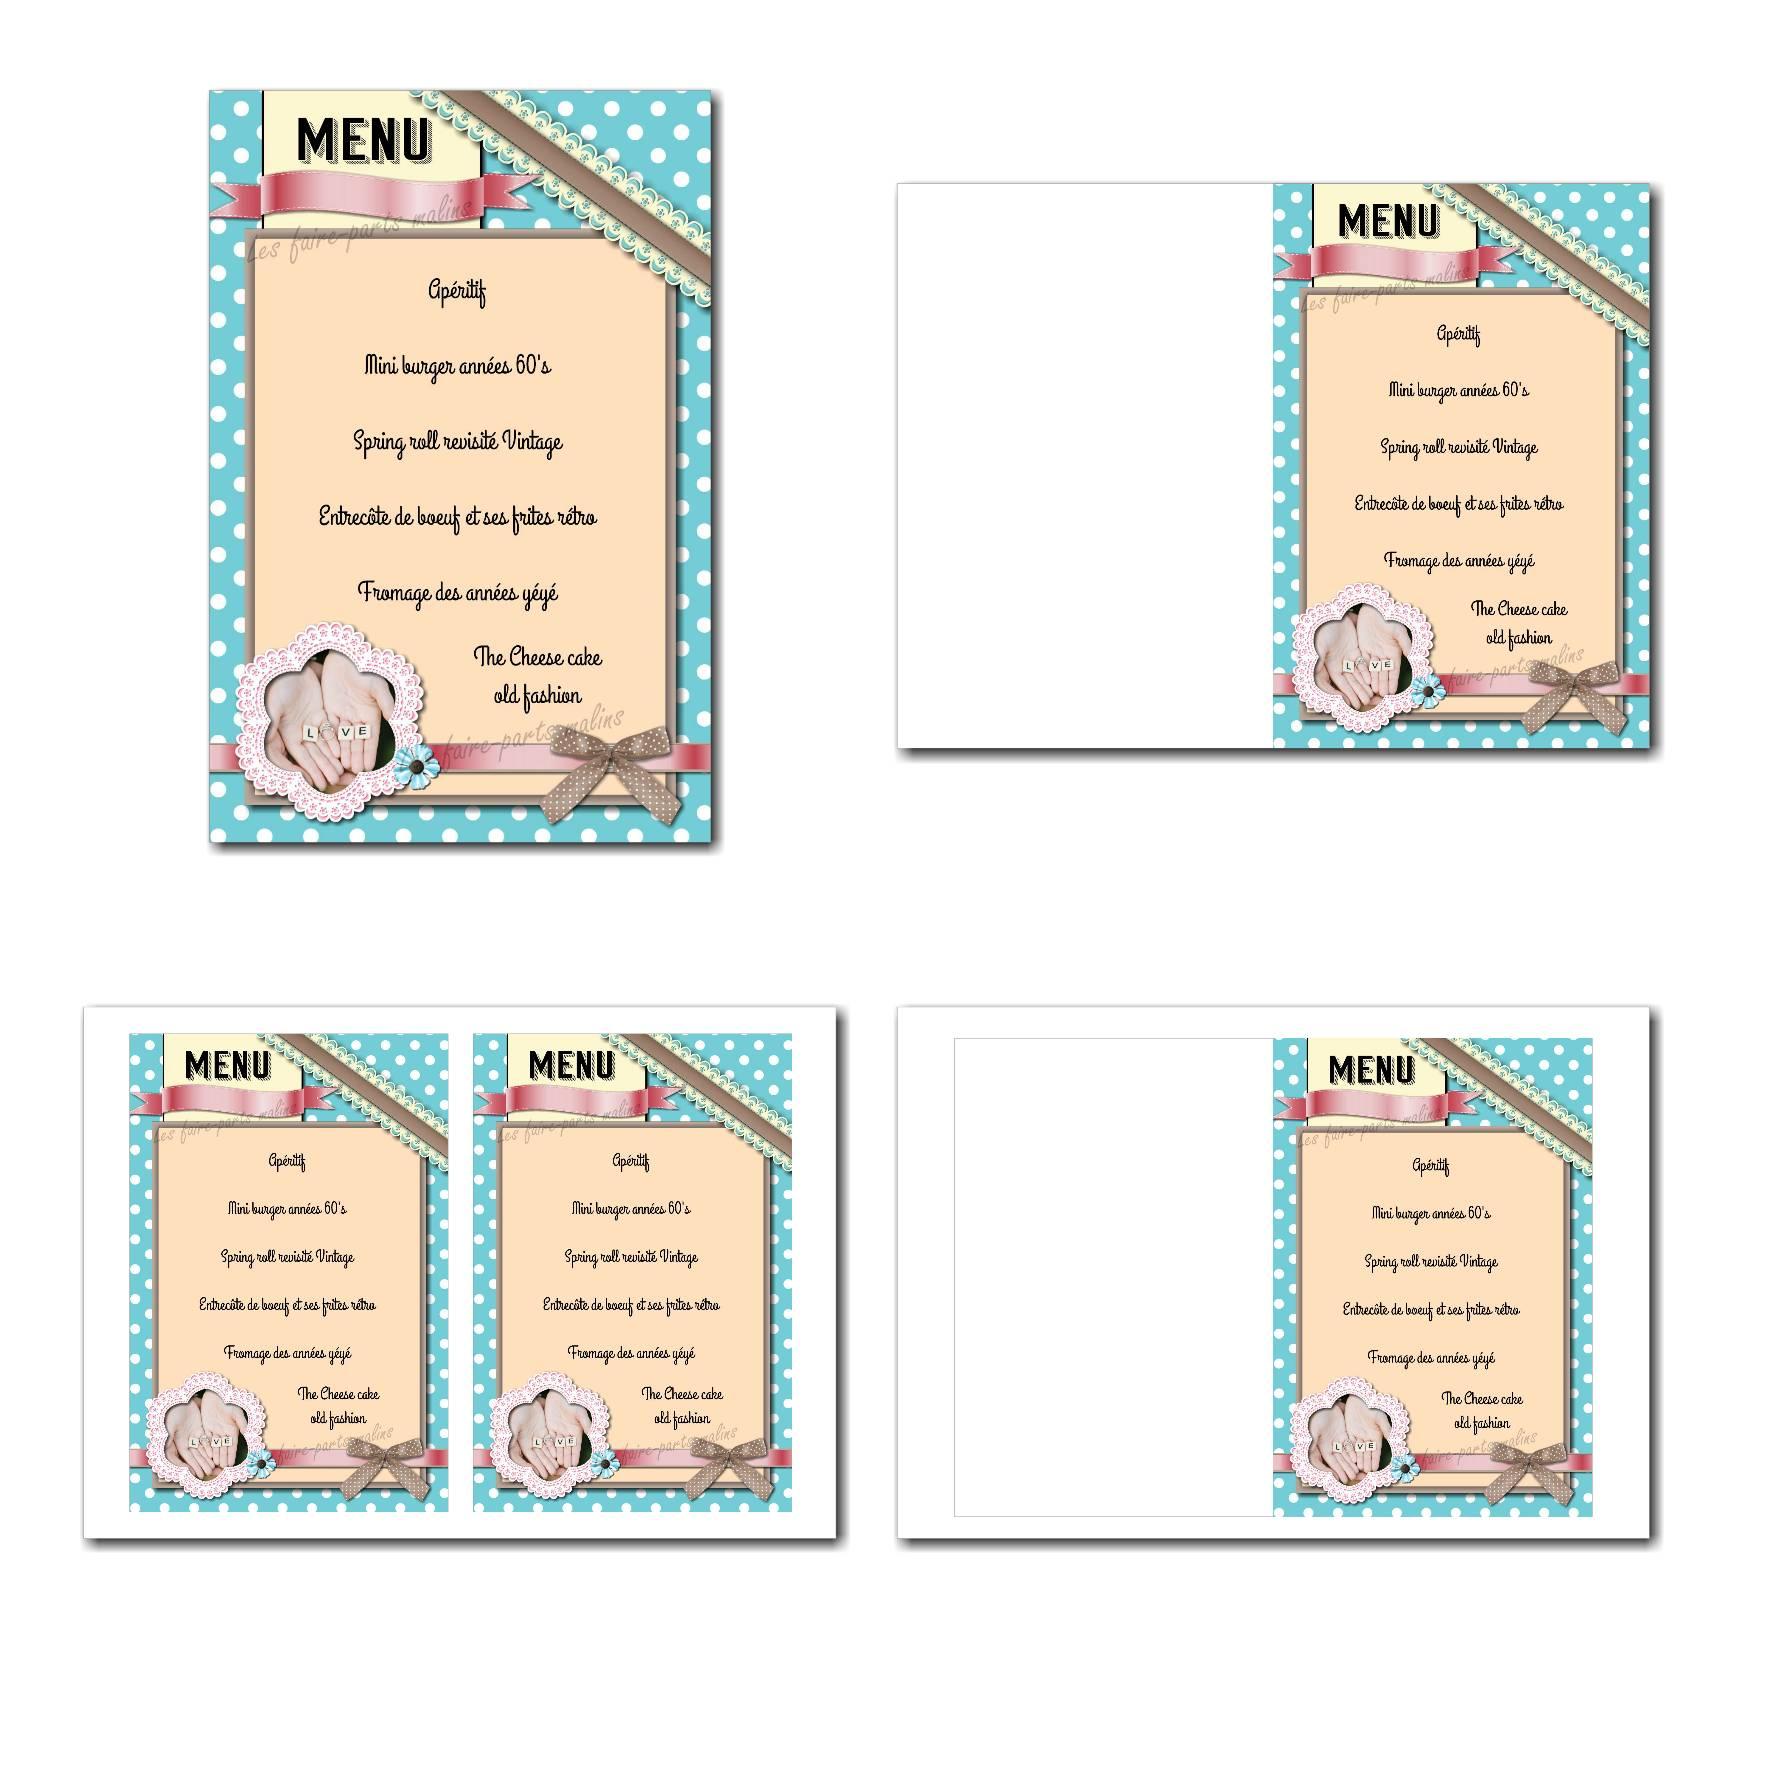 Pai 55 mariage menu 12x19